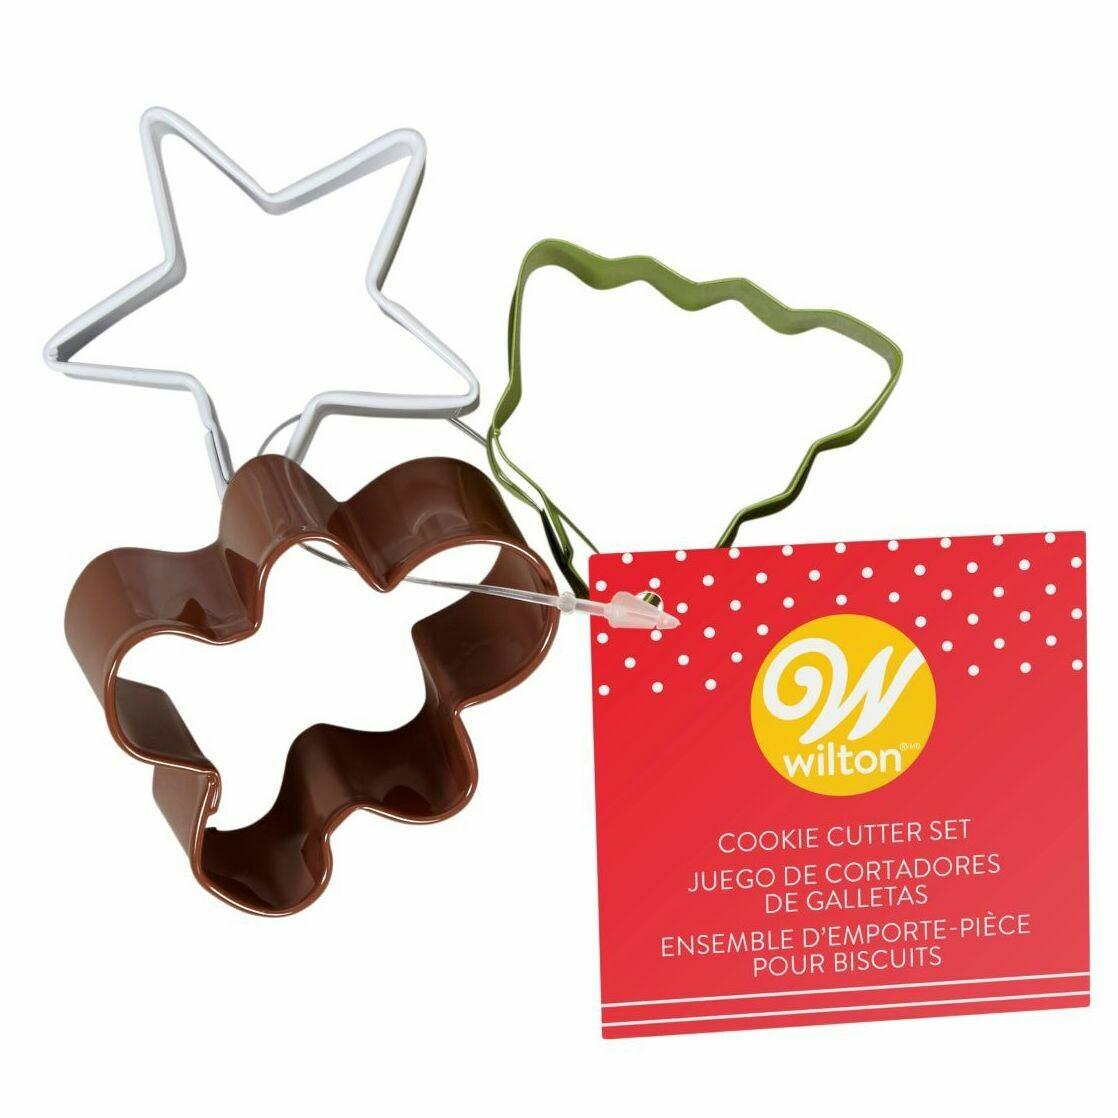 Wilton Christmas Cookie Cutter Set of 3 -MINI -Star, Tree, Gingerbread Man -  Σετ 3τεμ Χριστουγεννιάτικα Κουπ πατ